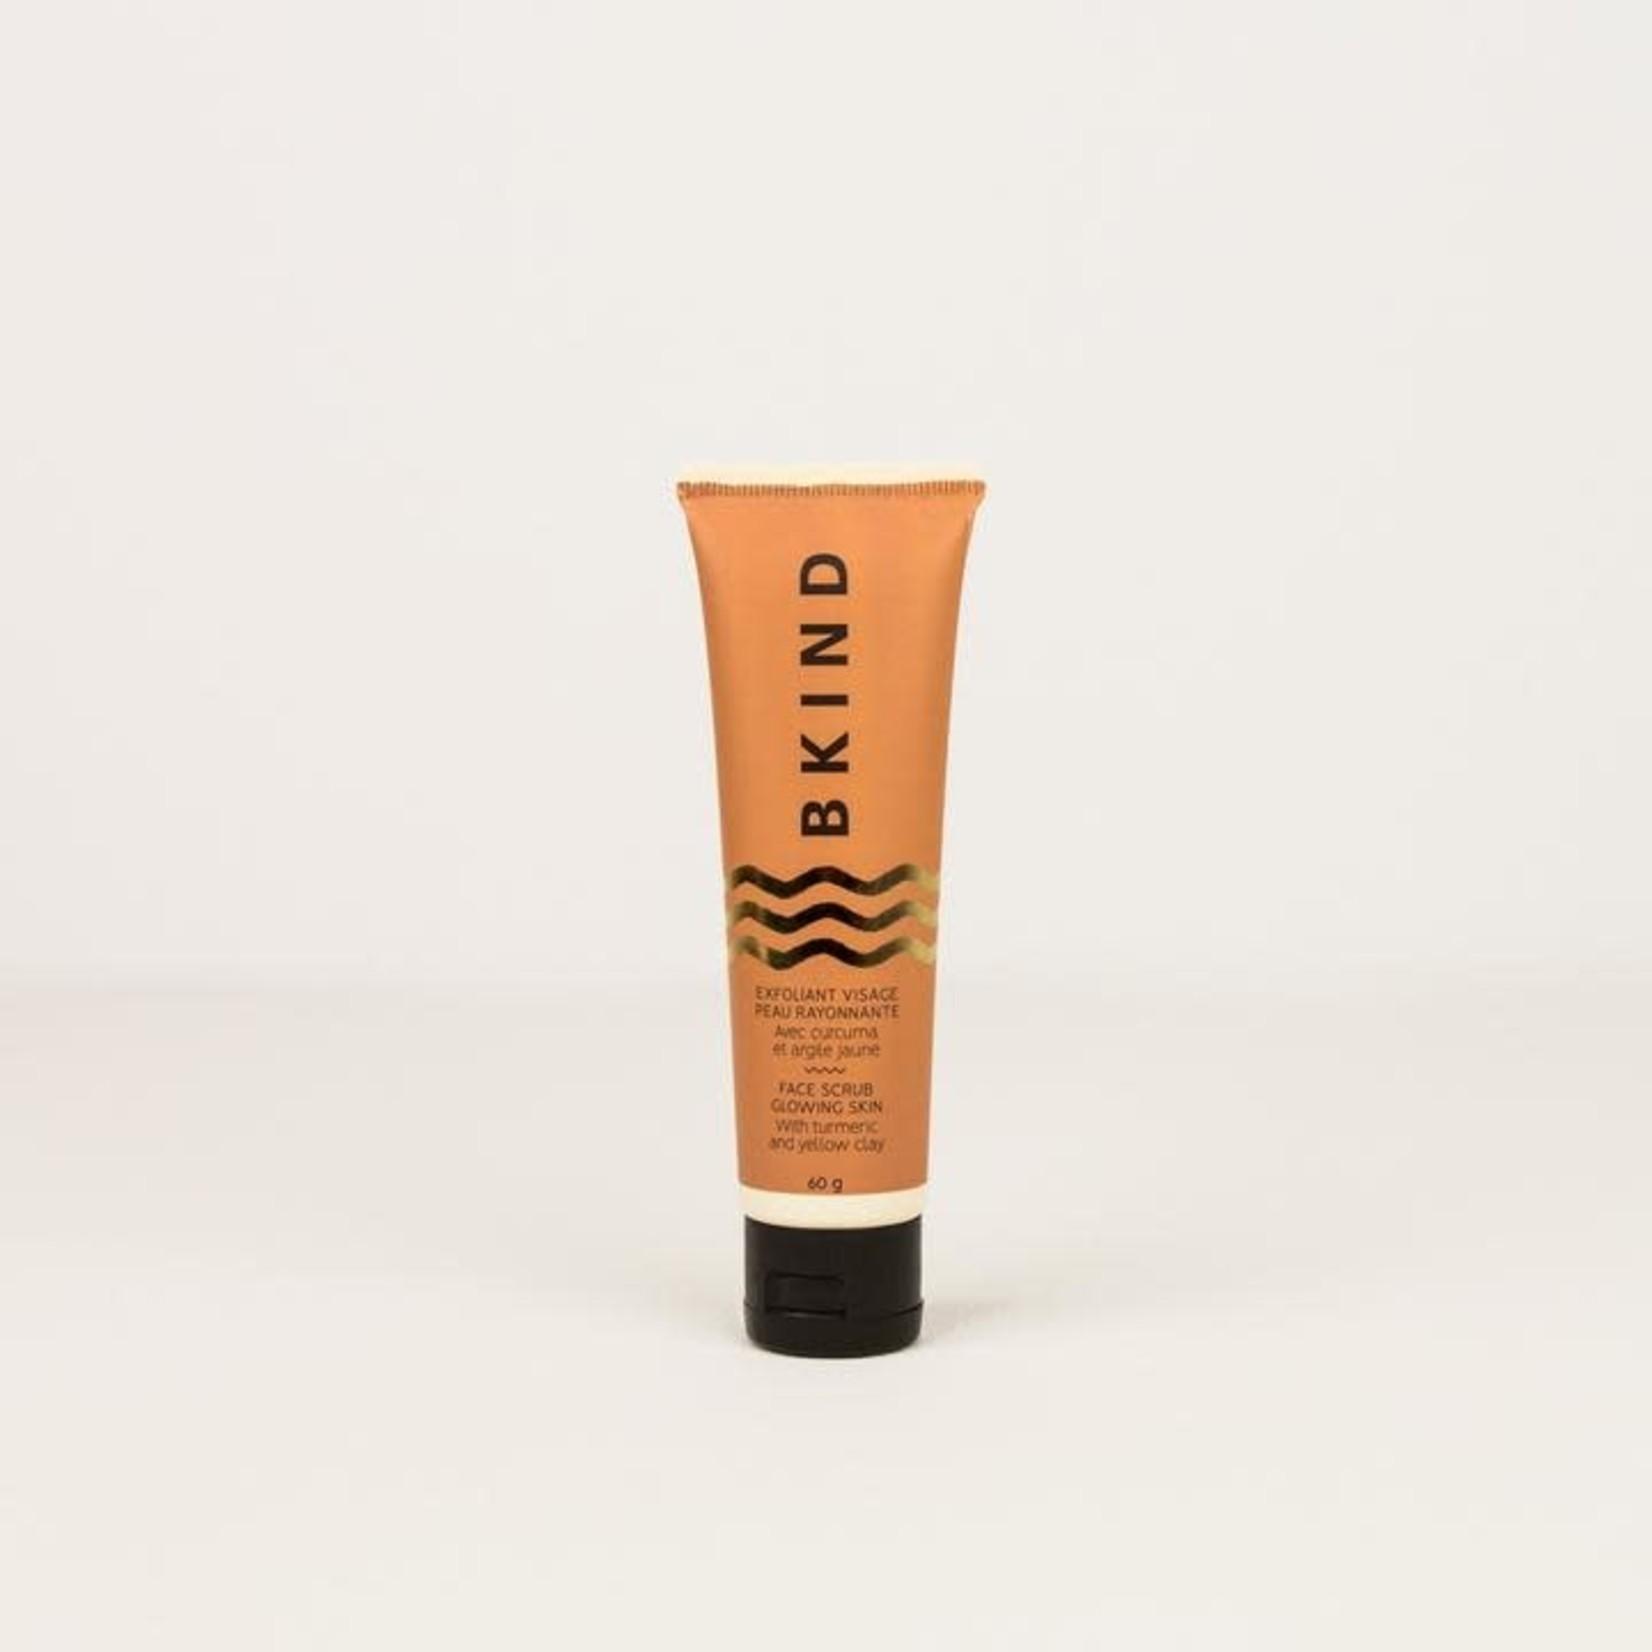 BKIND BKIND - Exfoliant visage / Peau rayonnante